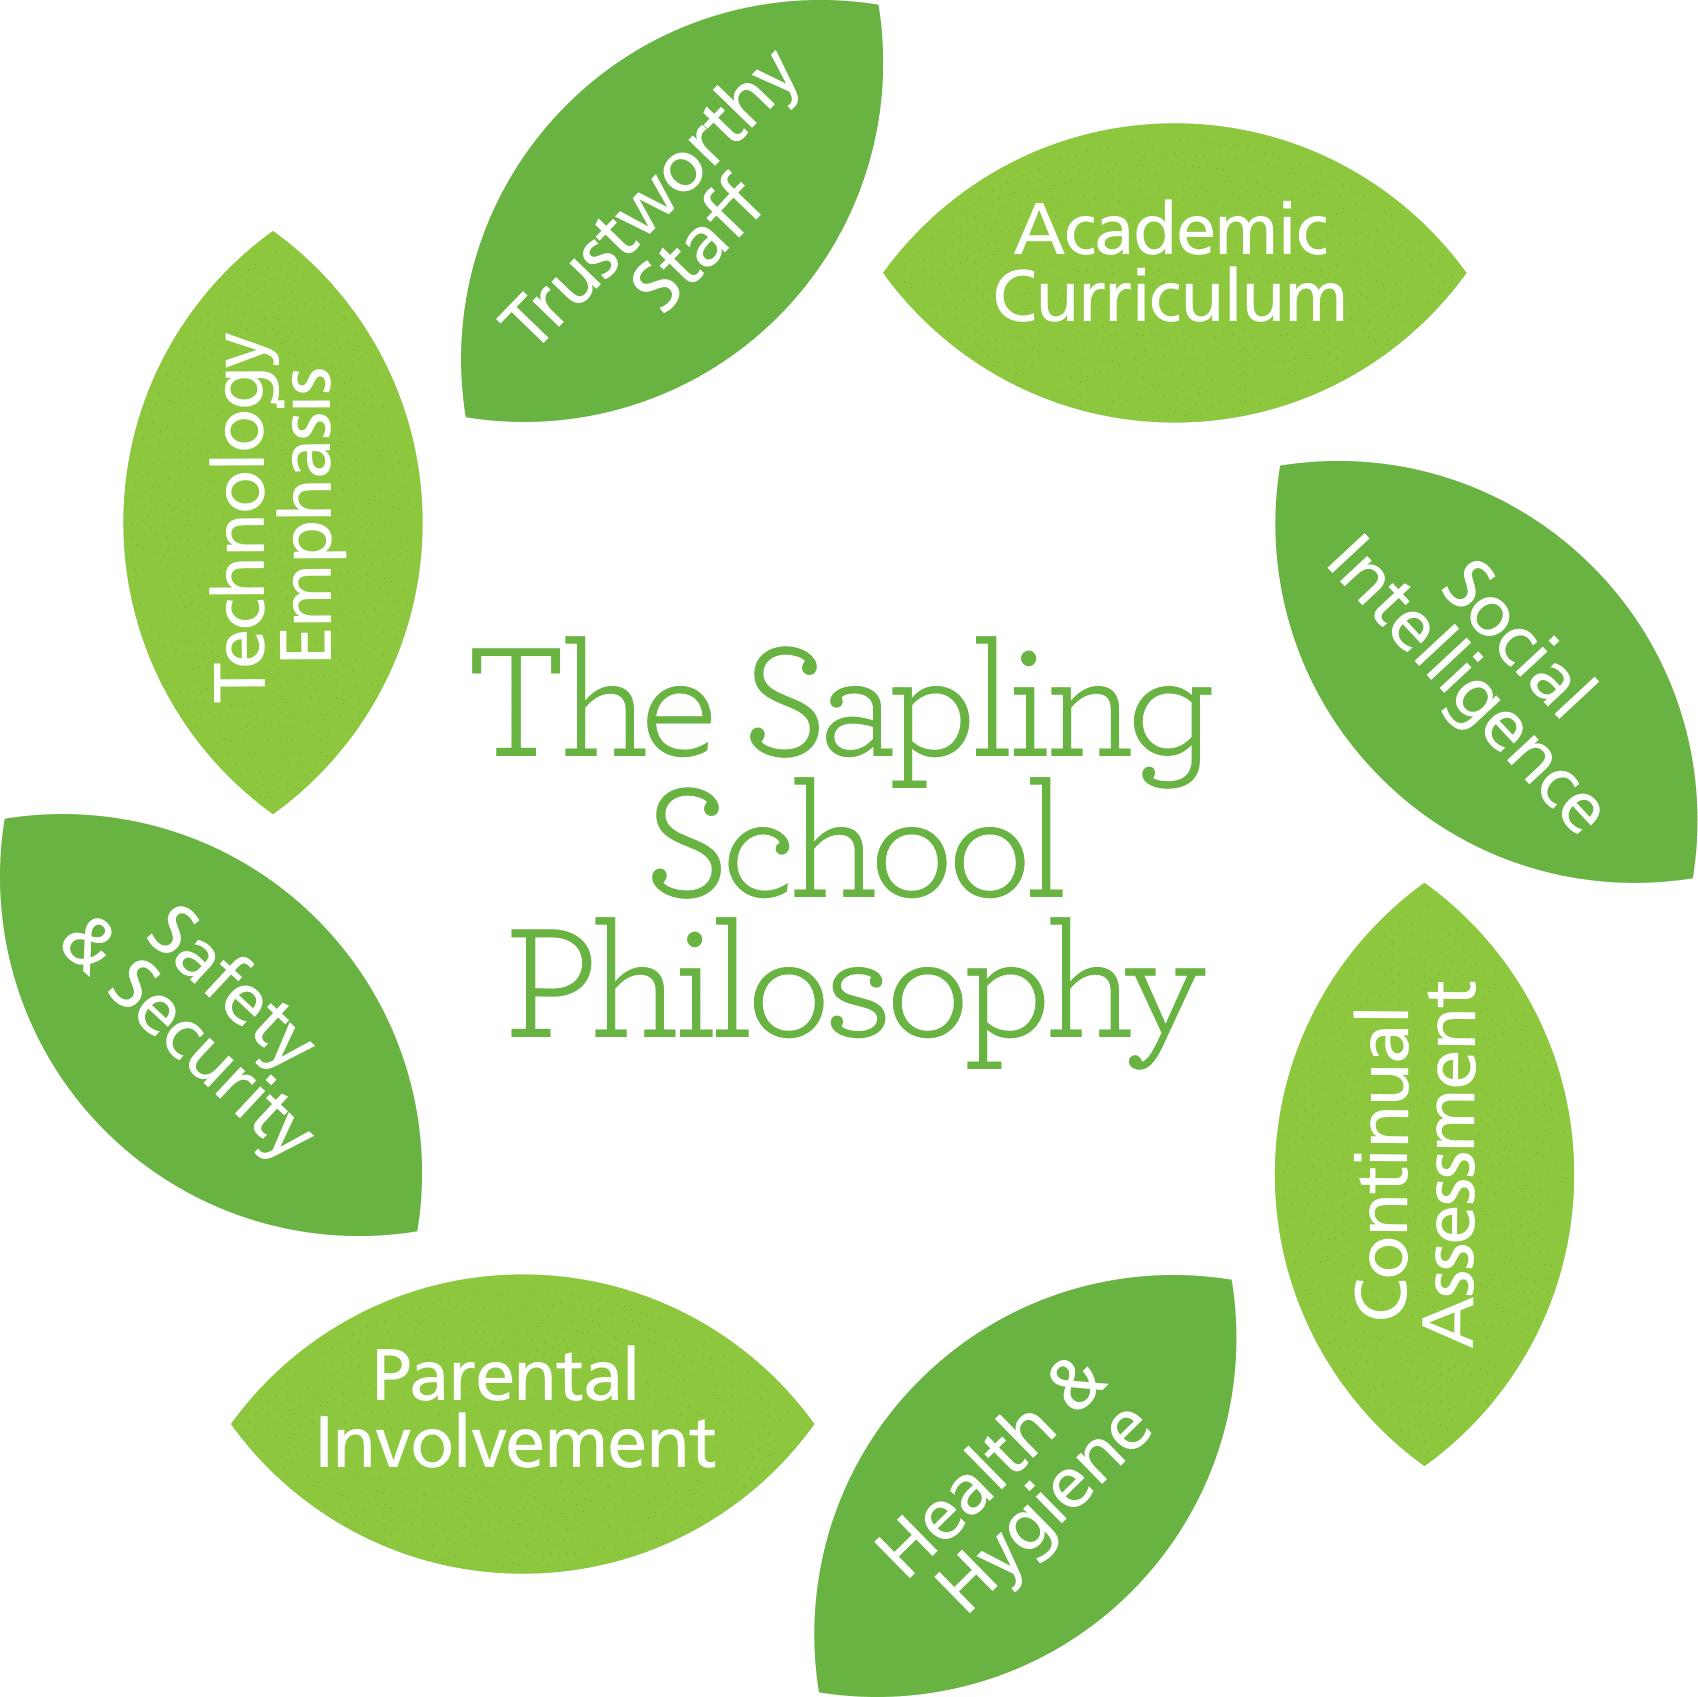 The Sapling School Philosophy